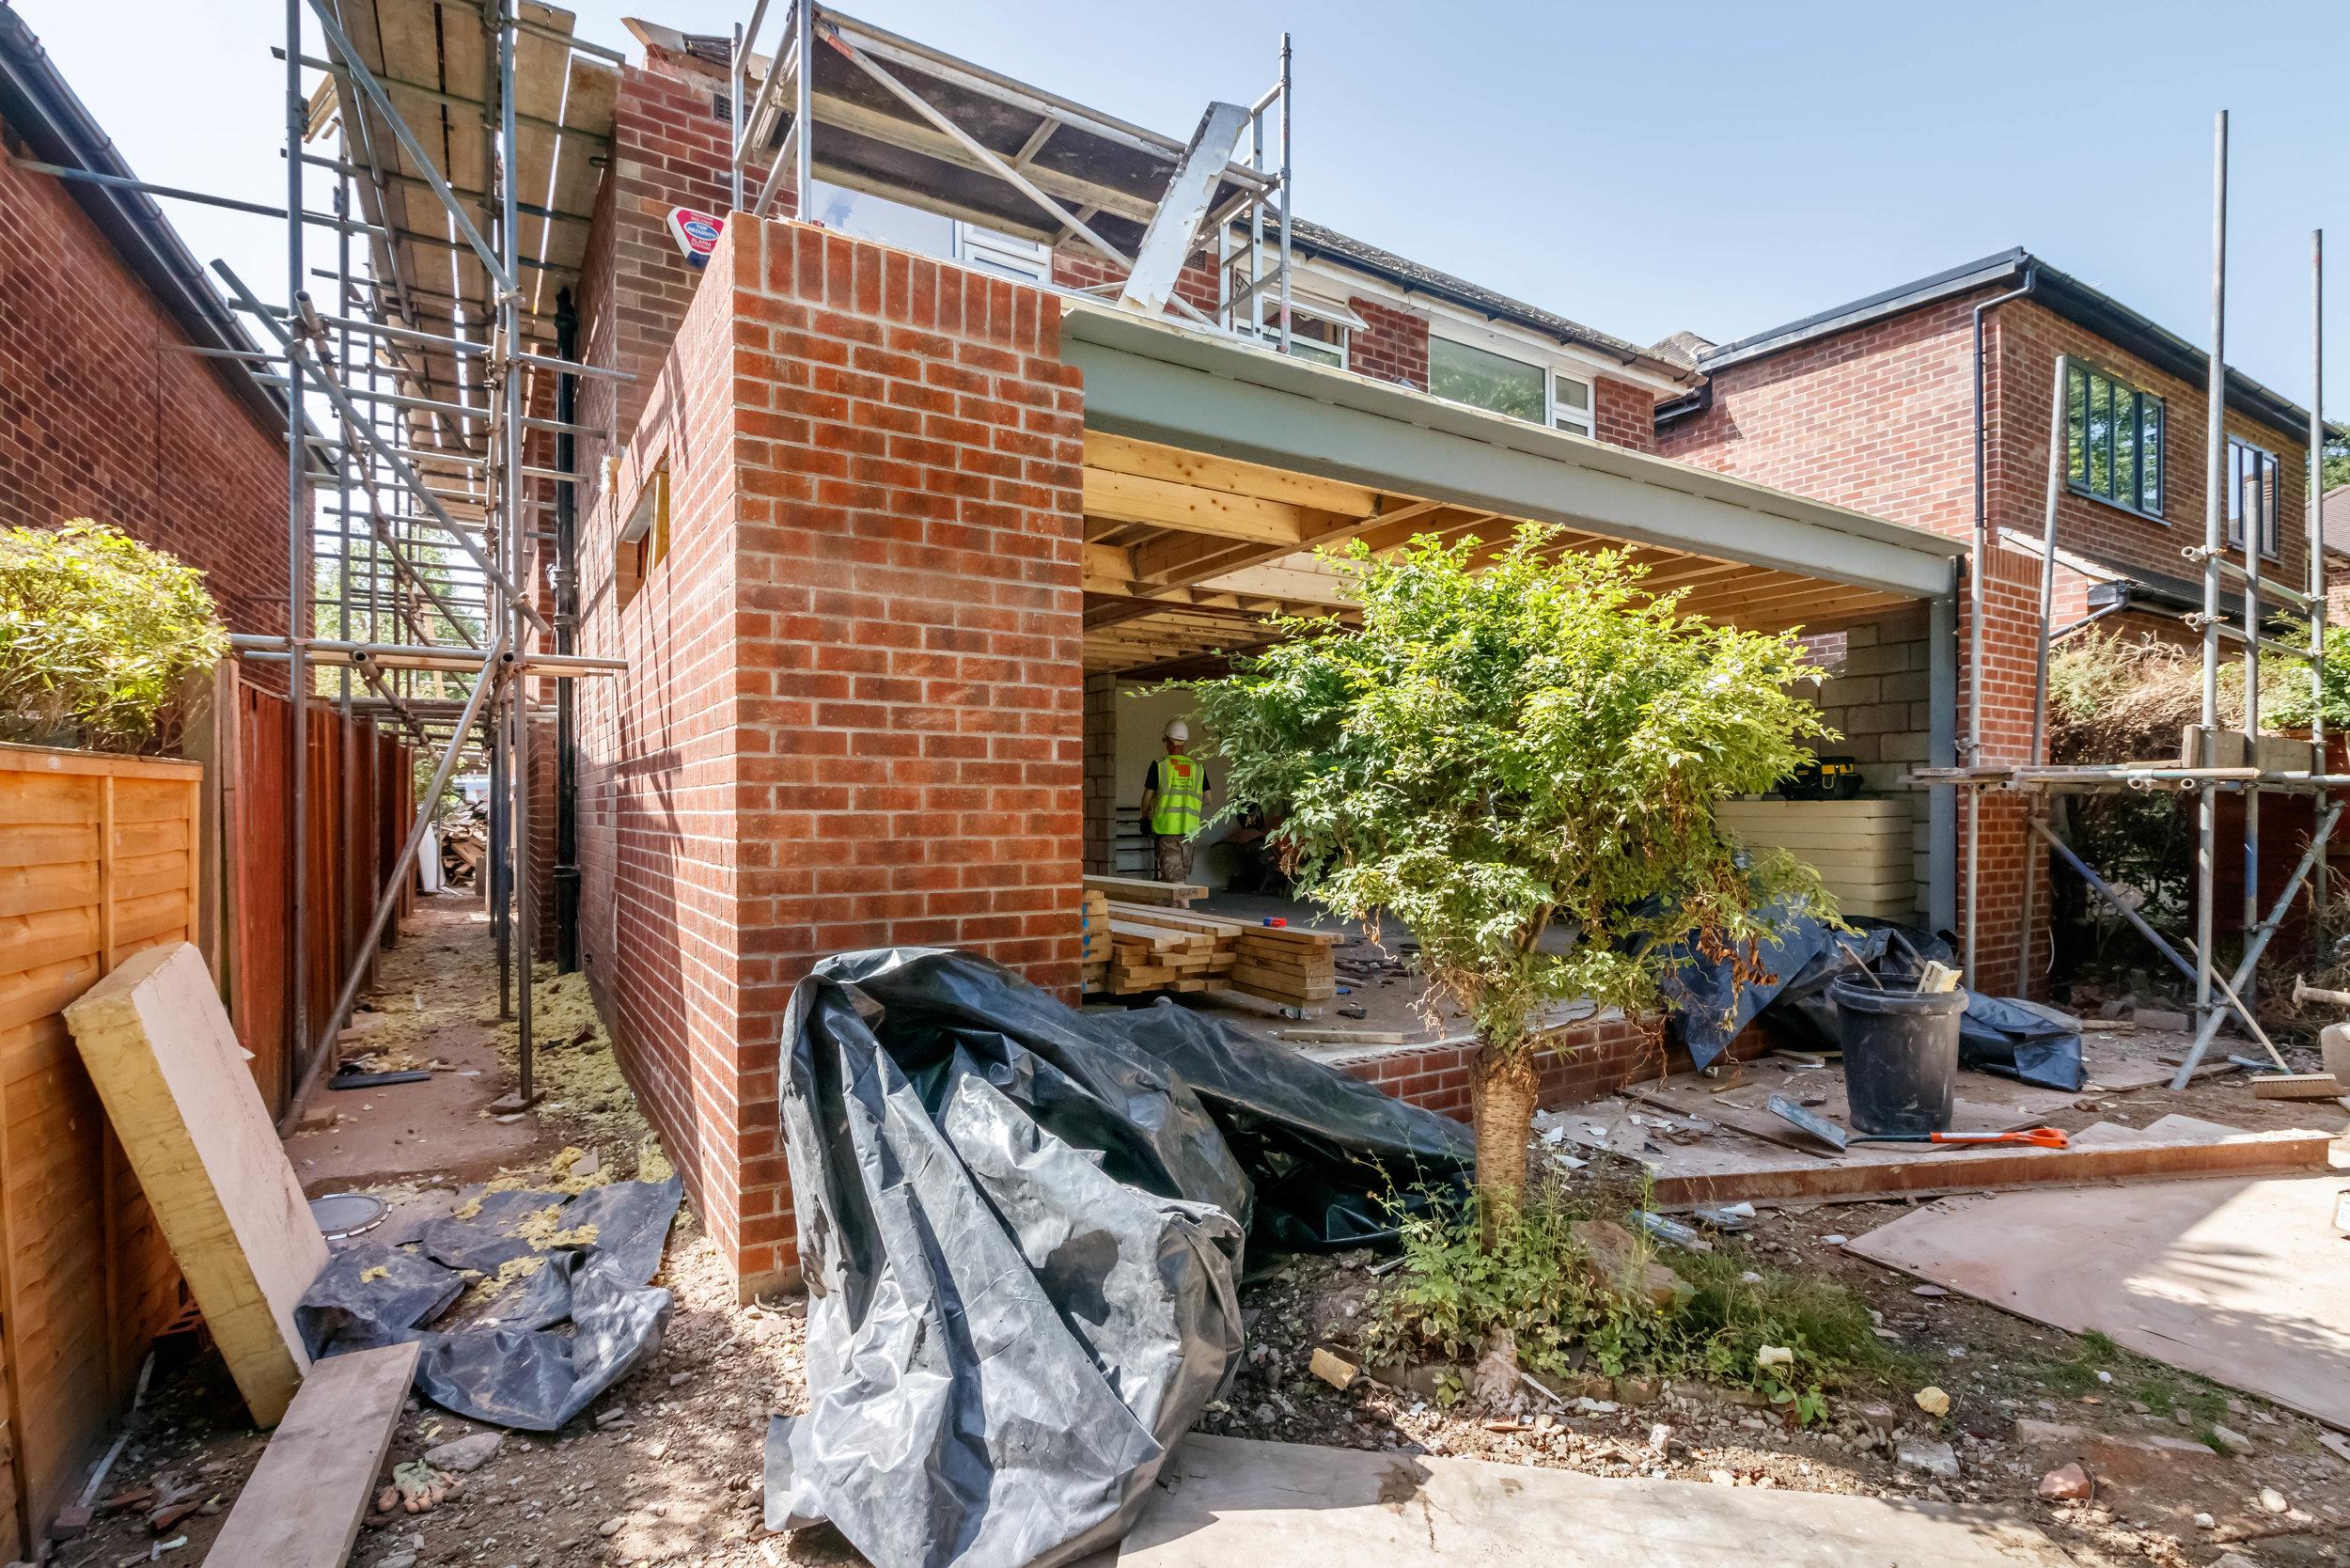 PropertyPhotographs-05151.jpg